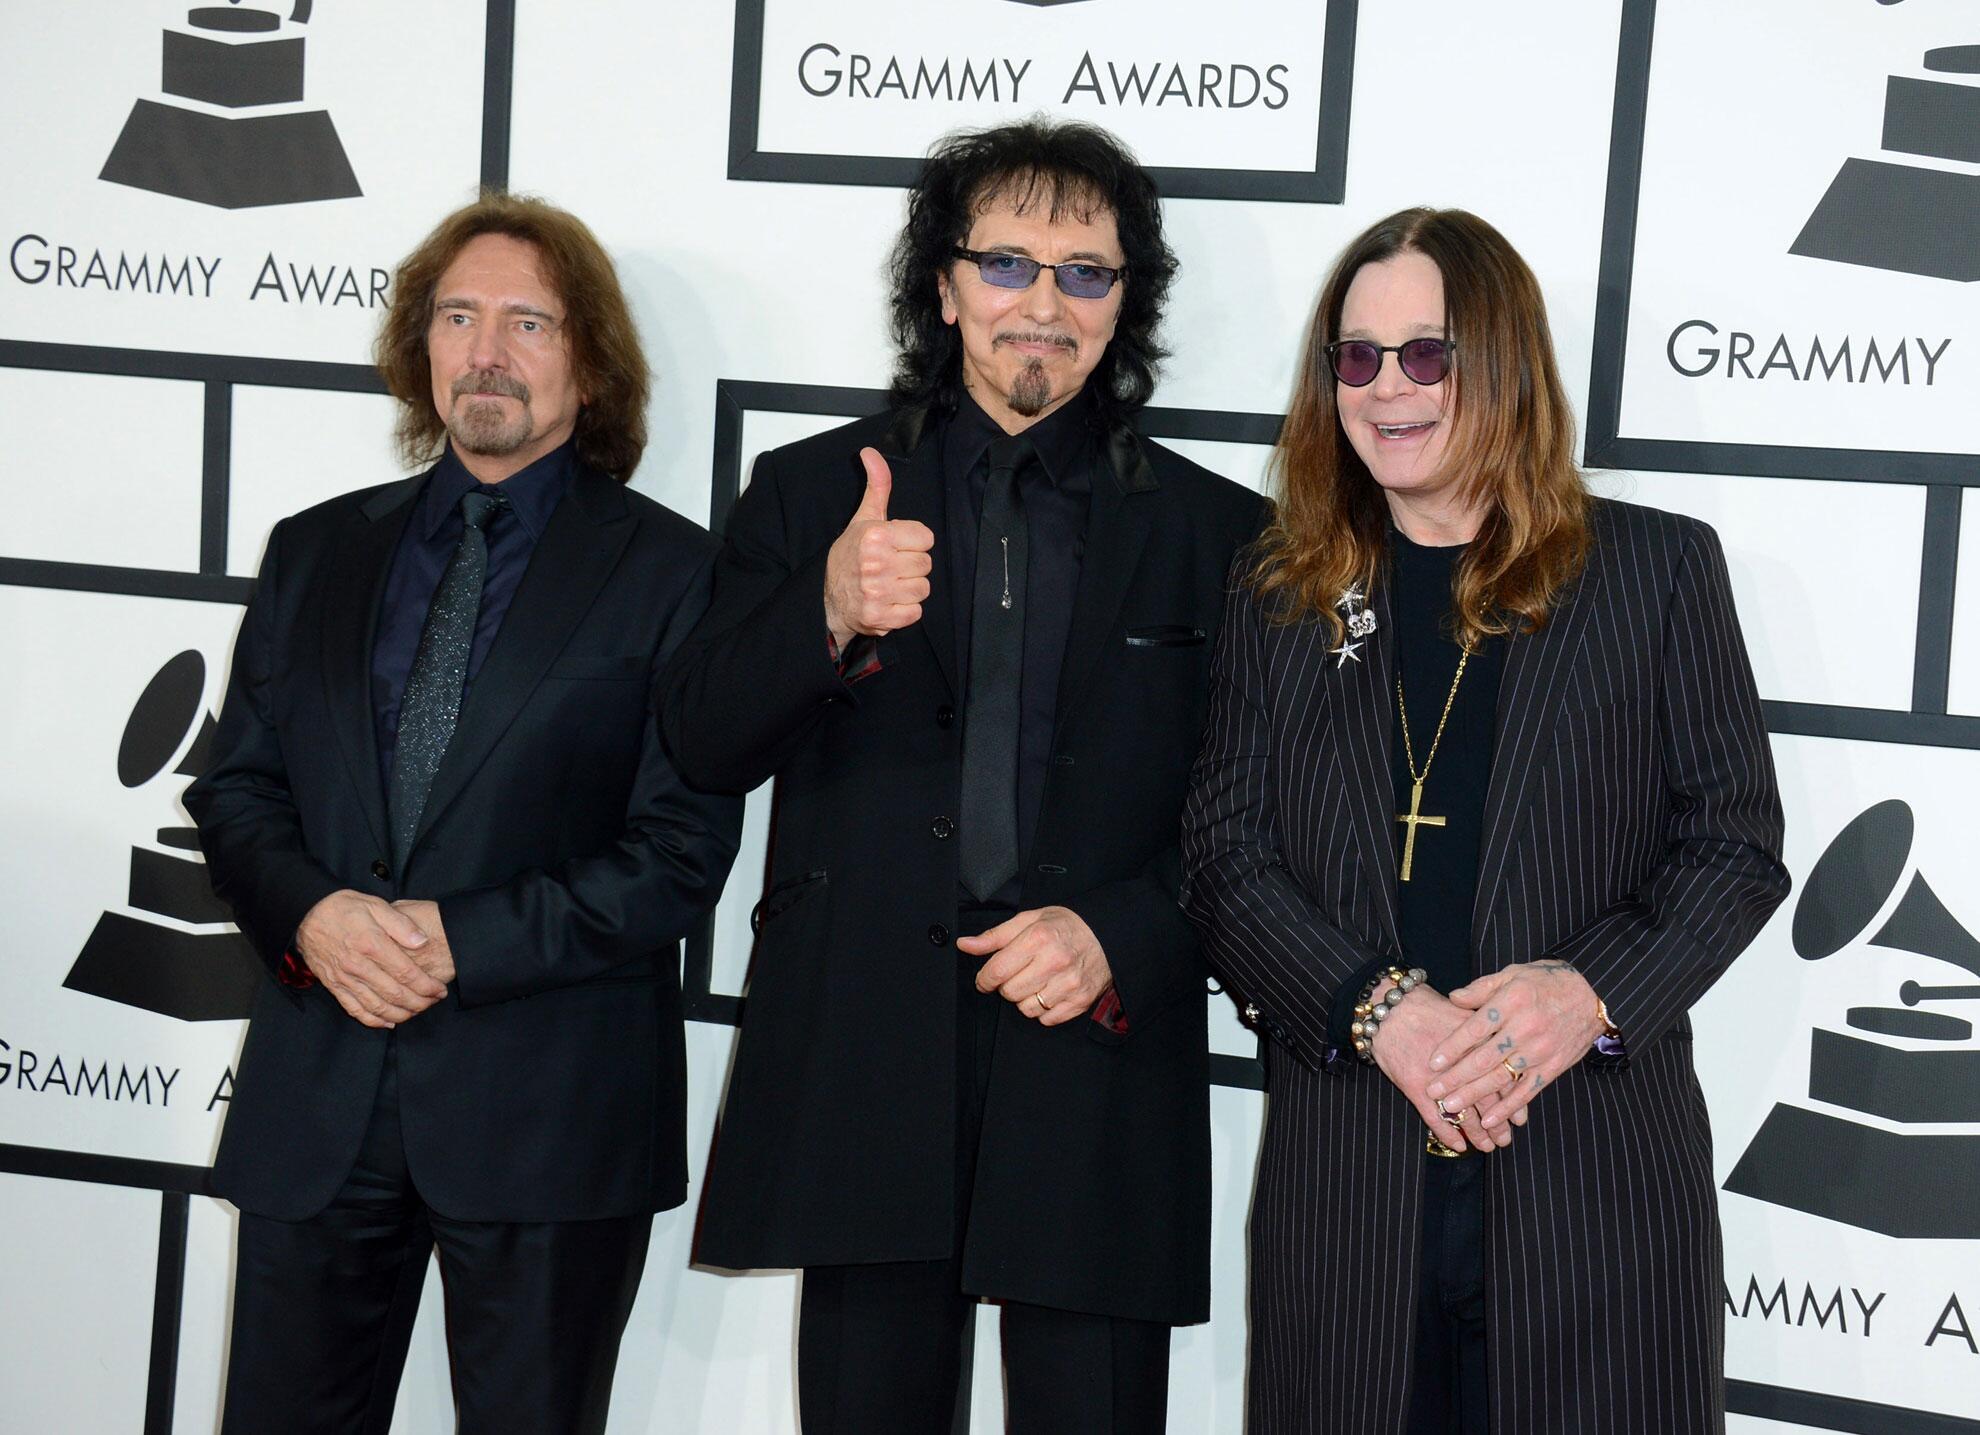 Bild zu Geezer Butler (li.), Tony Iommi (Mi.) und Ozzy Osbourne alias Black Sabbath